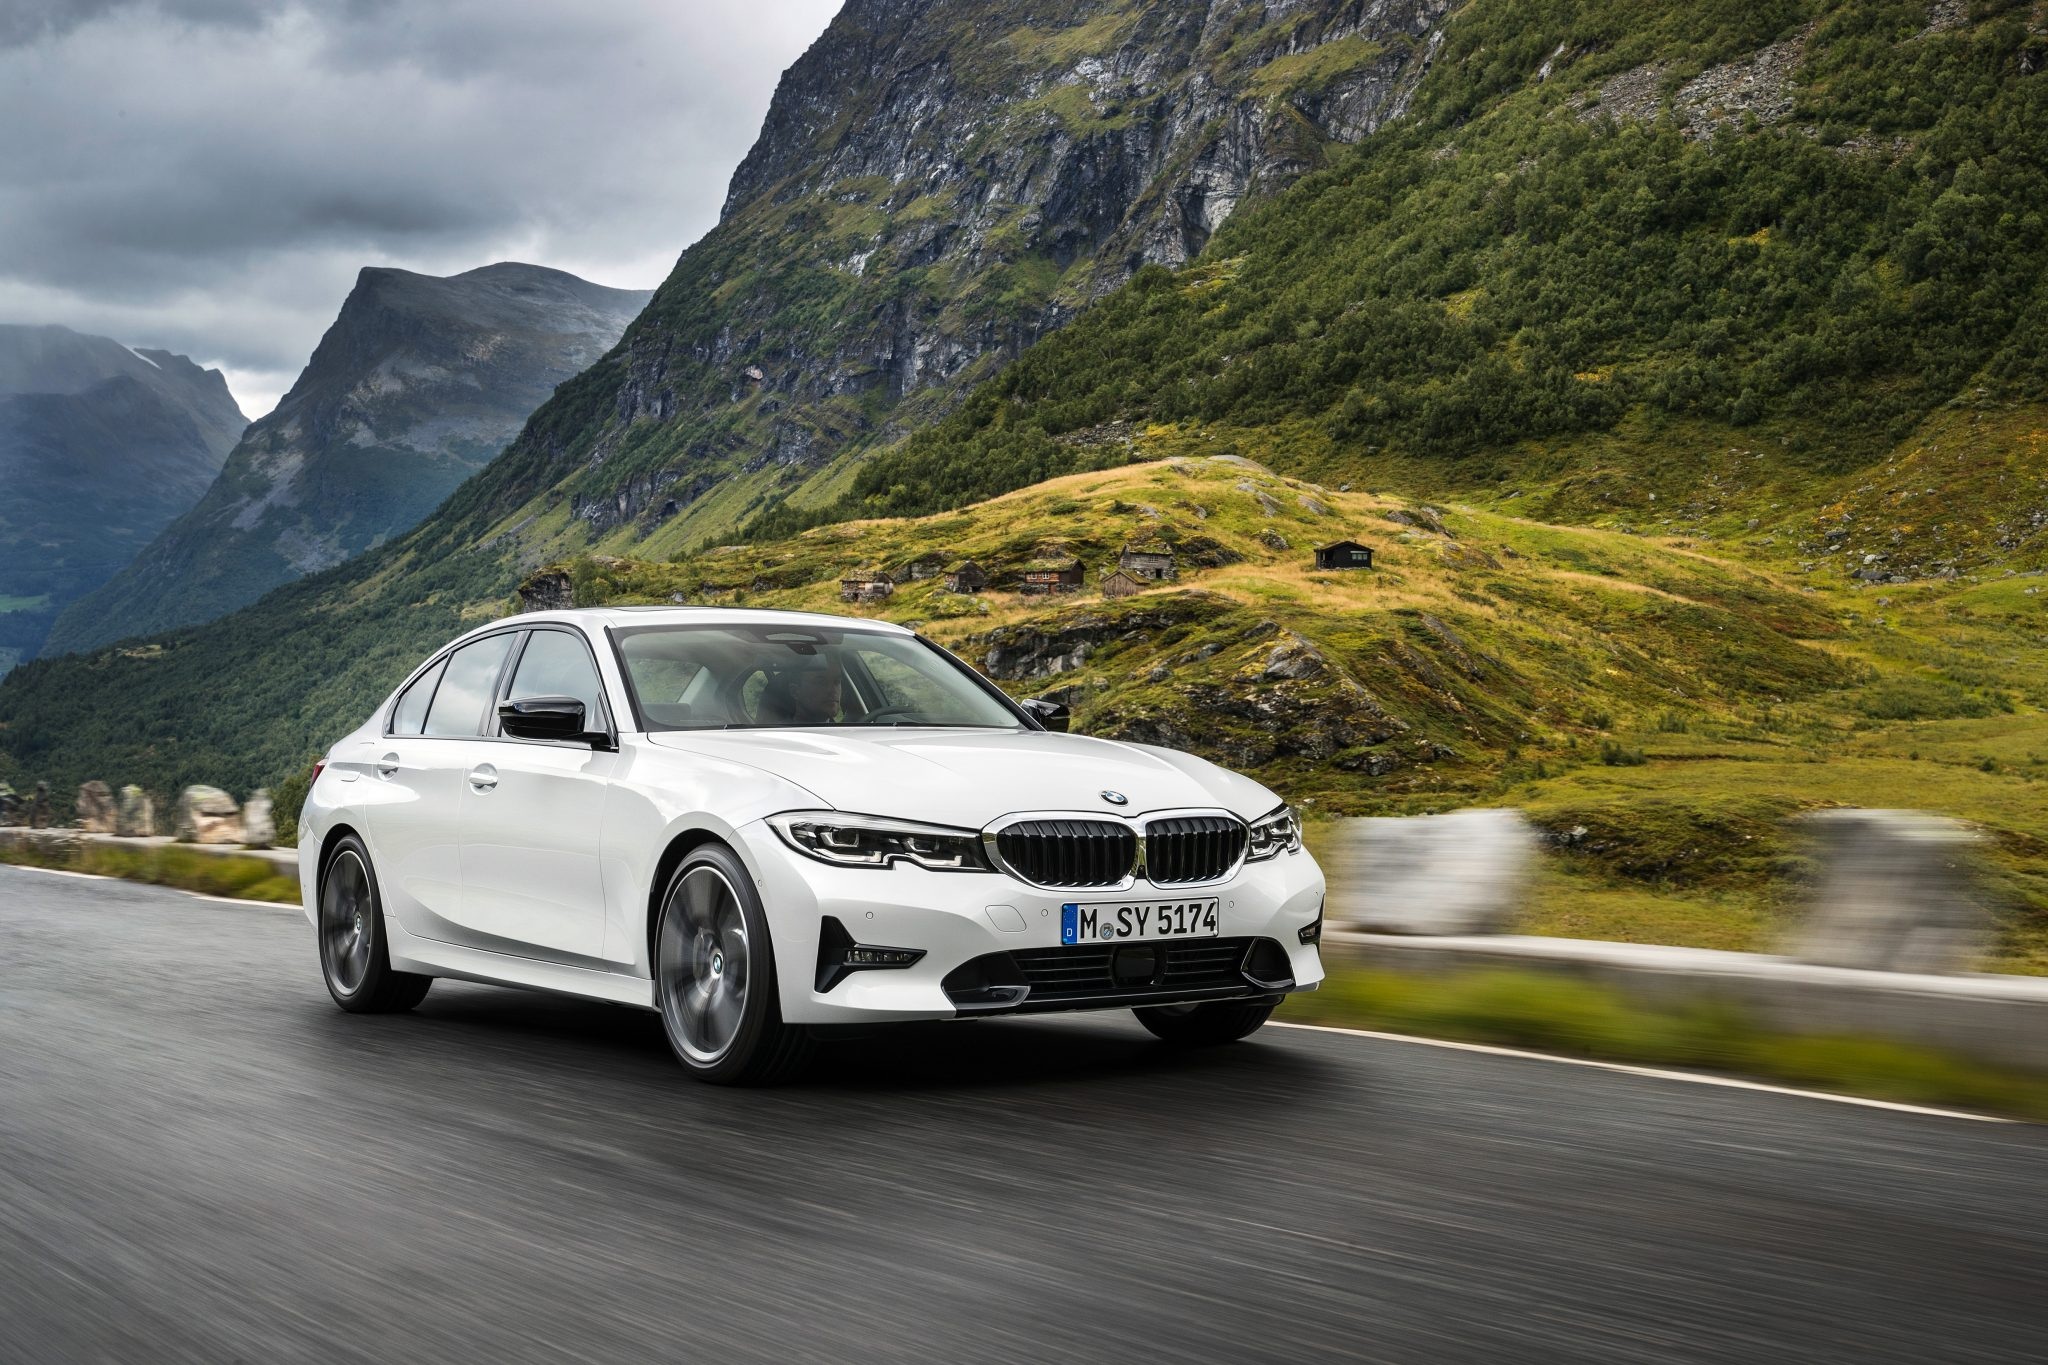 De BMW 3 Serie Sedan